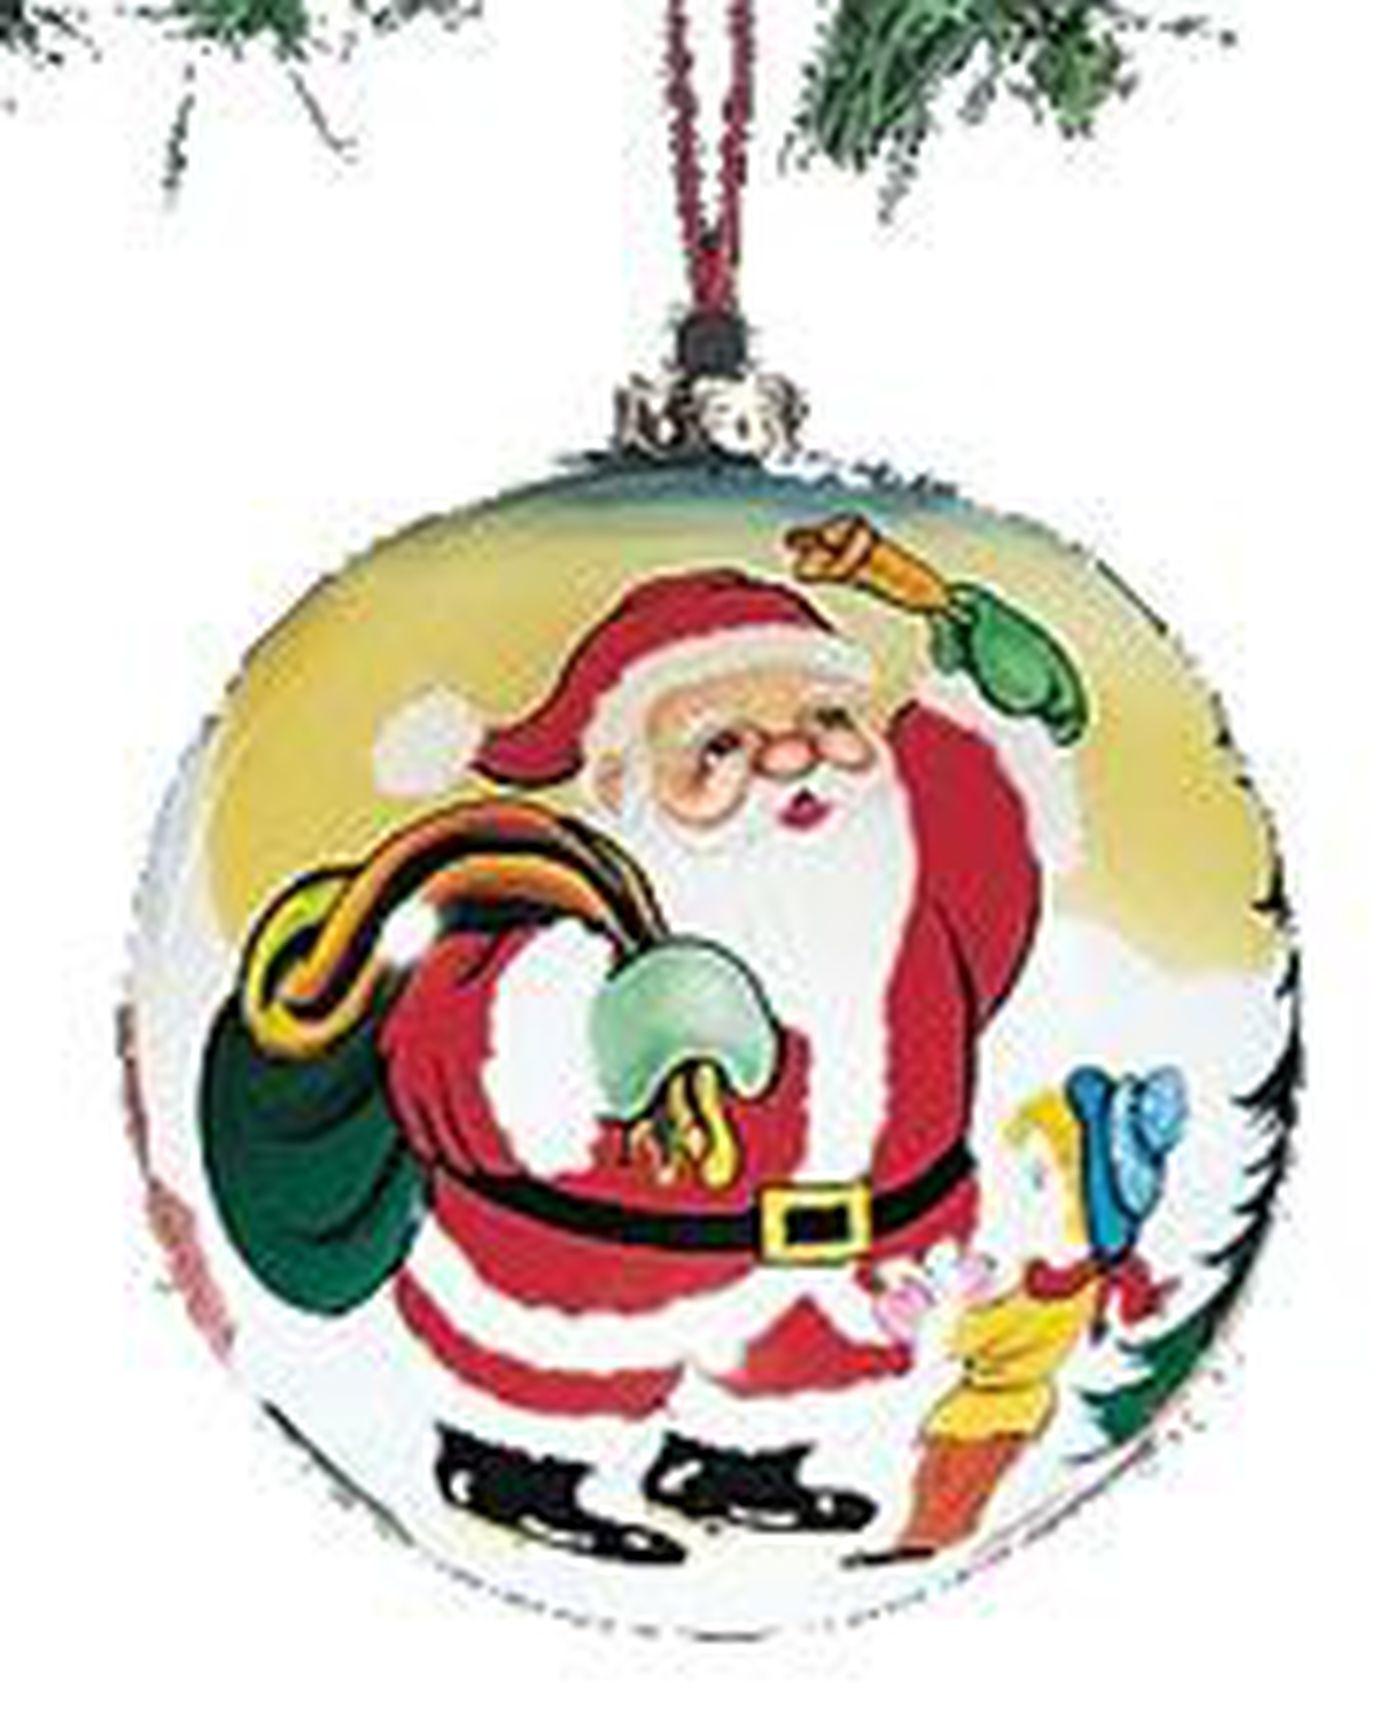 2006 Hallmark Ornaments Debut at Treasure House